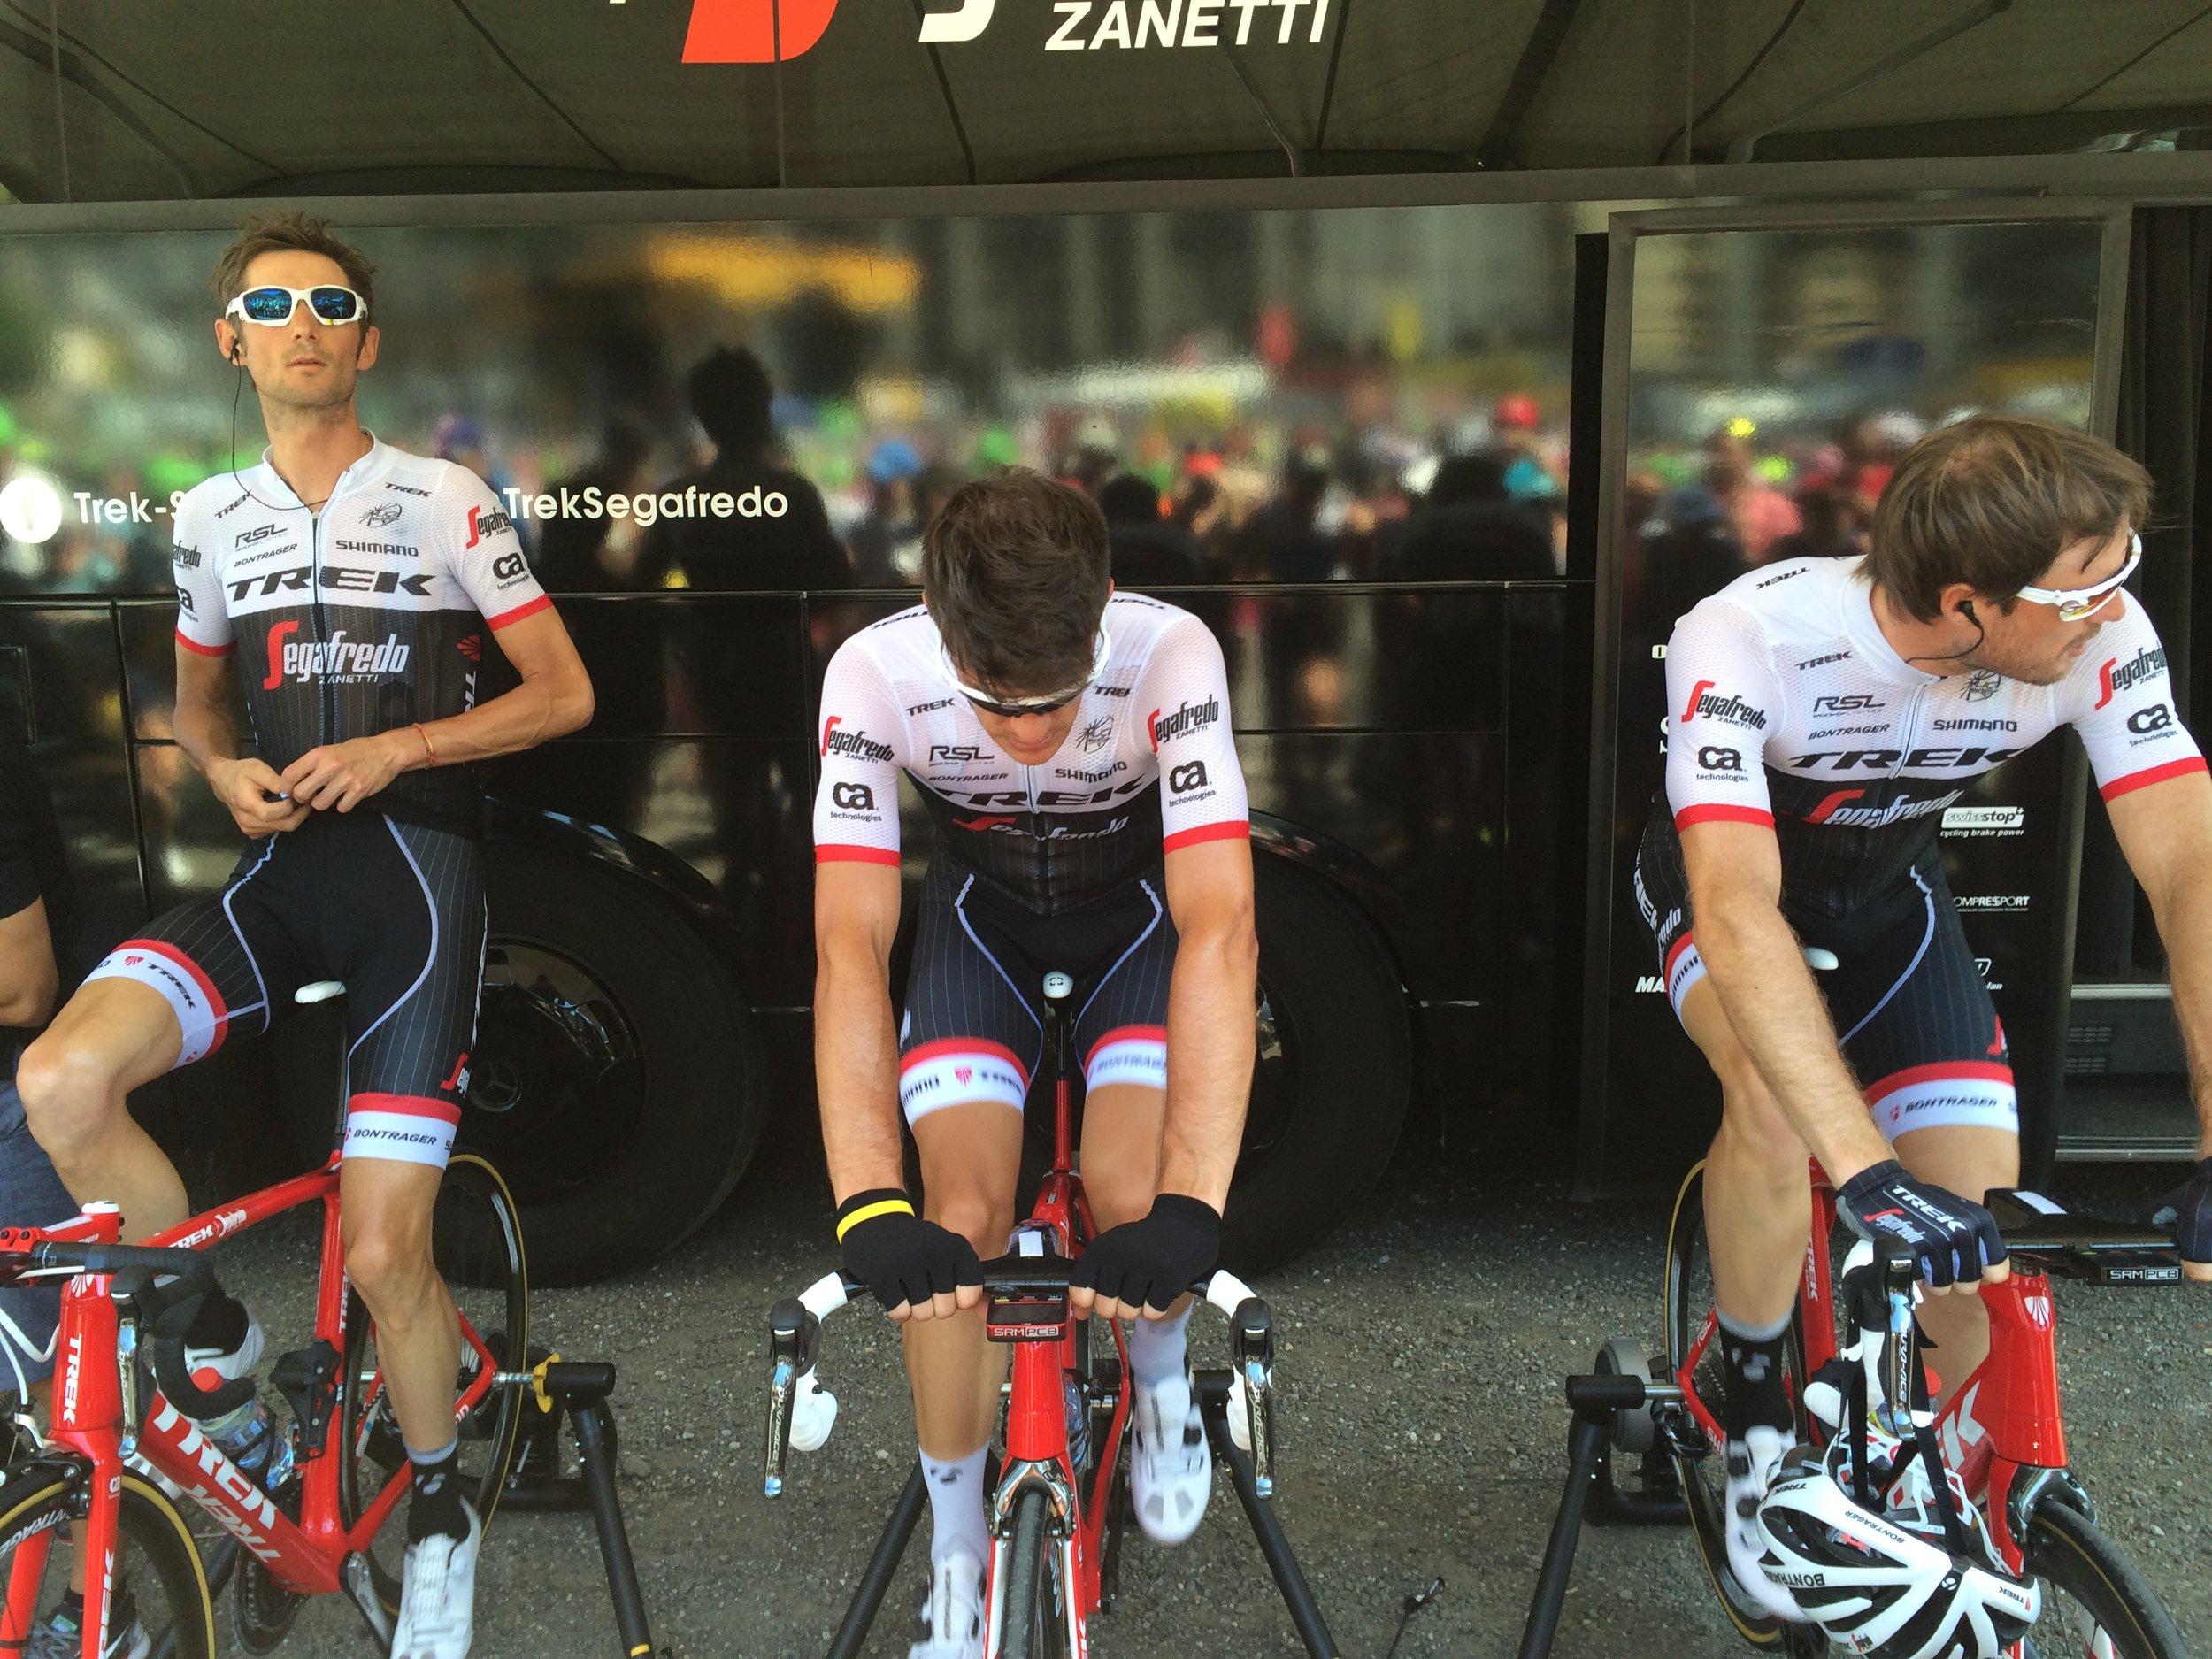 Up-close & personal -Stage Start in Vielha, Spain, Tour de France tour 2016